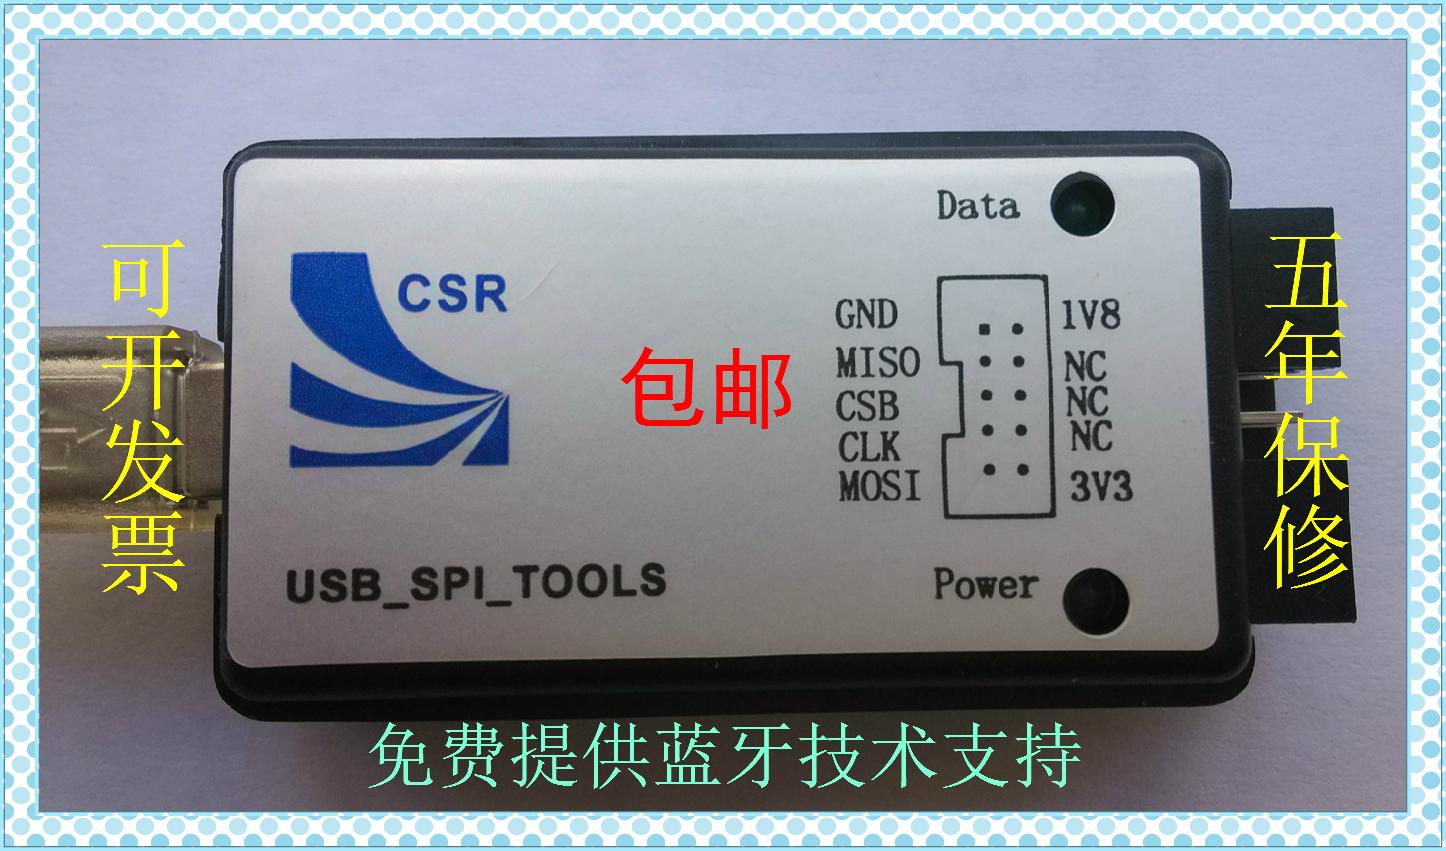 Csr bluetooth programmer usb to spi download software development.